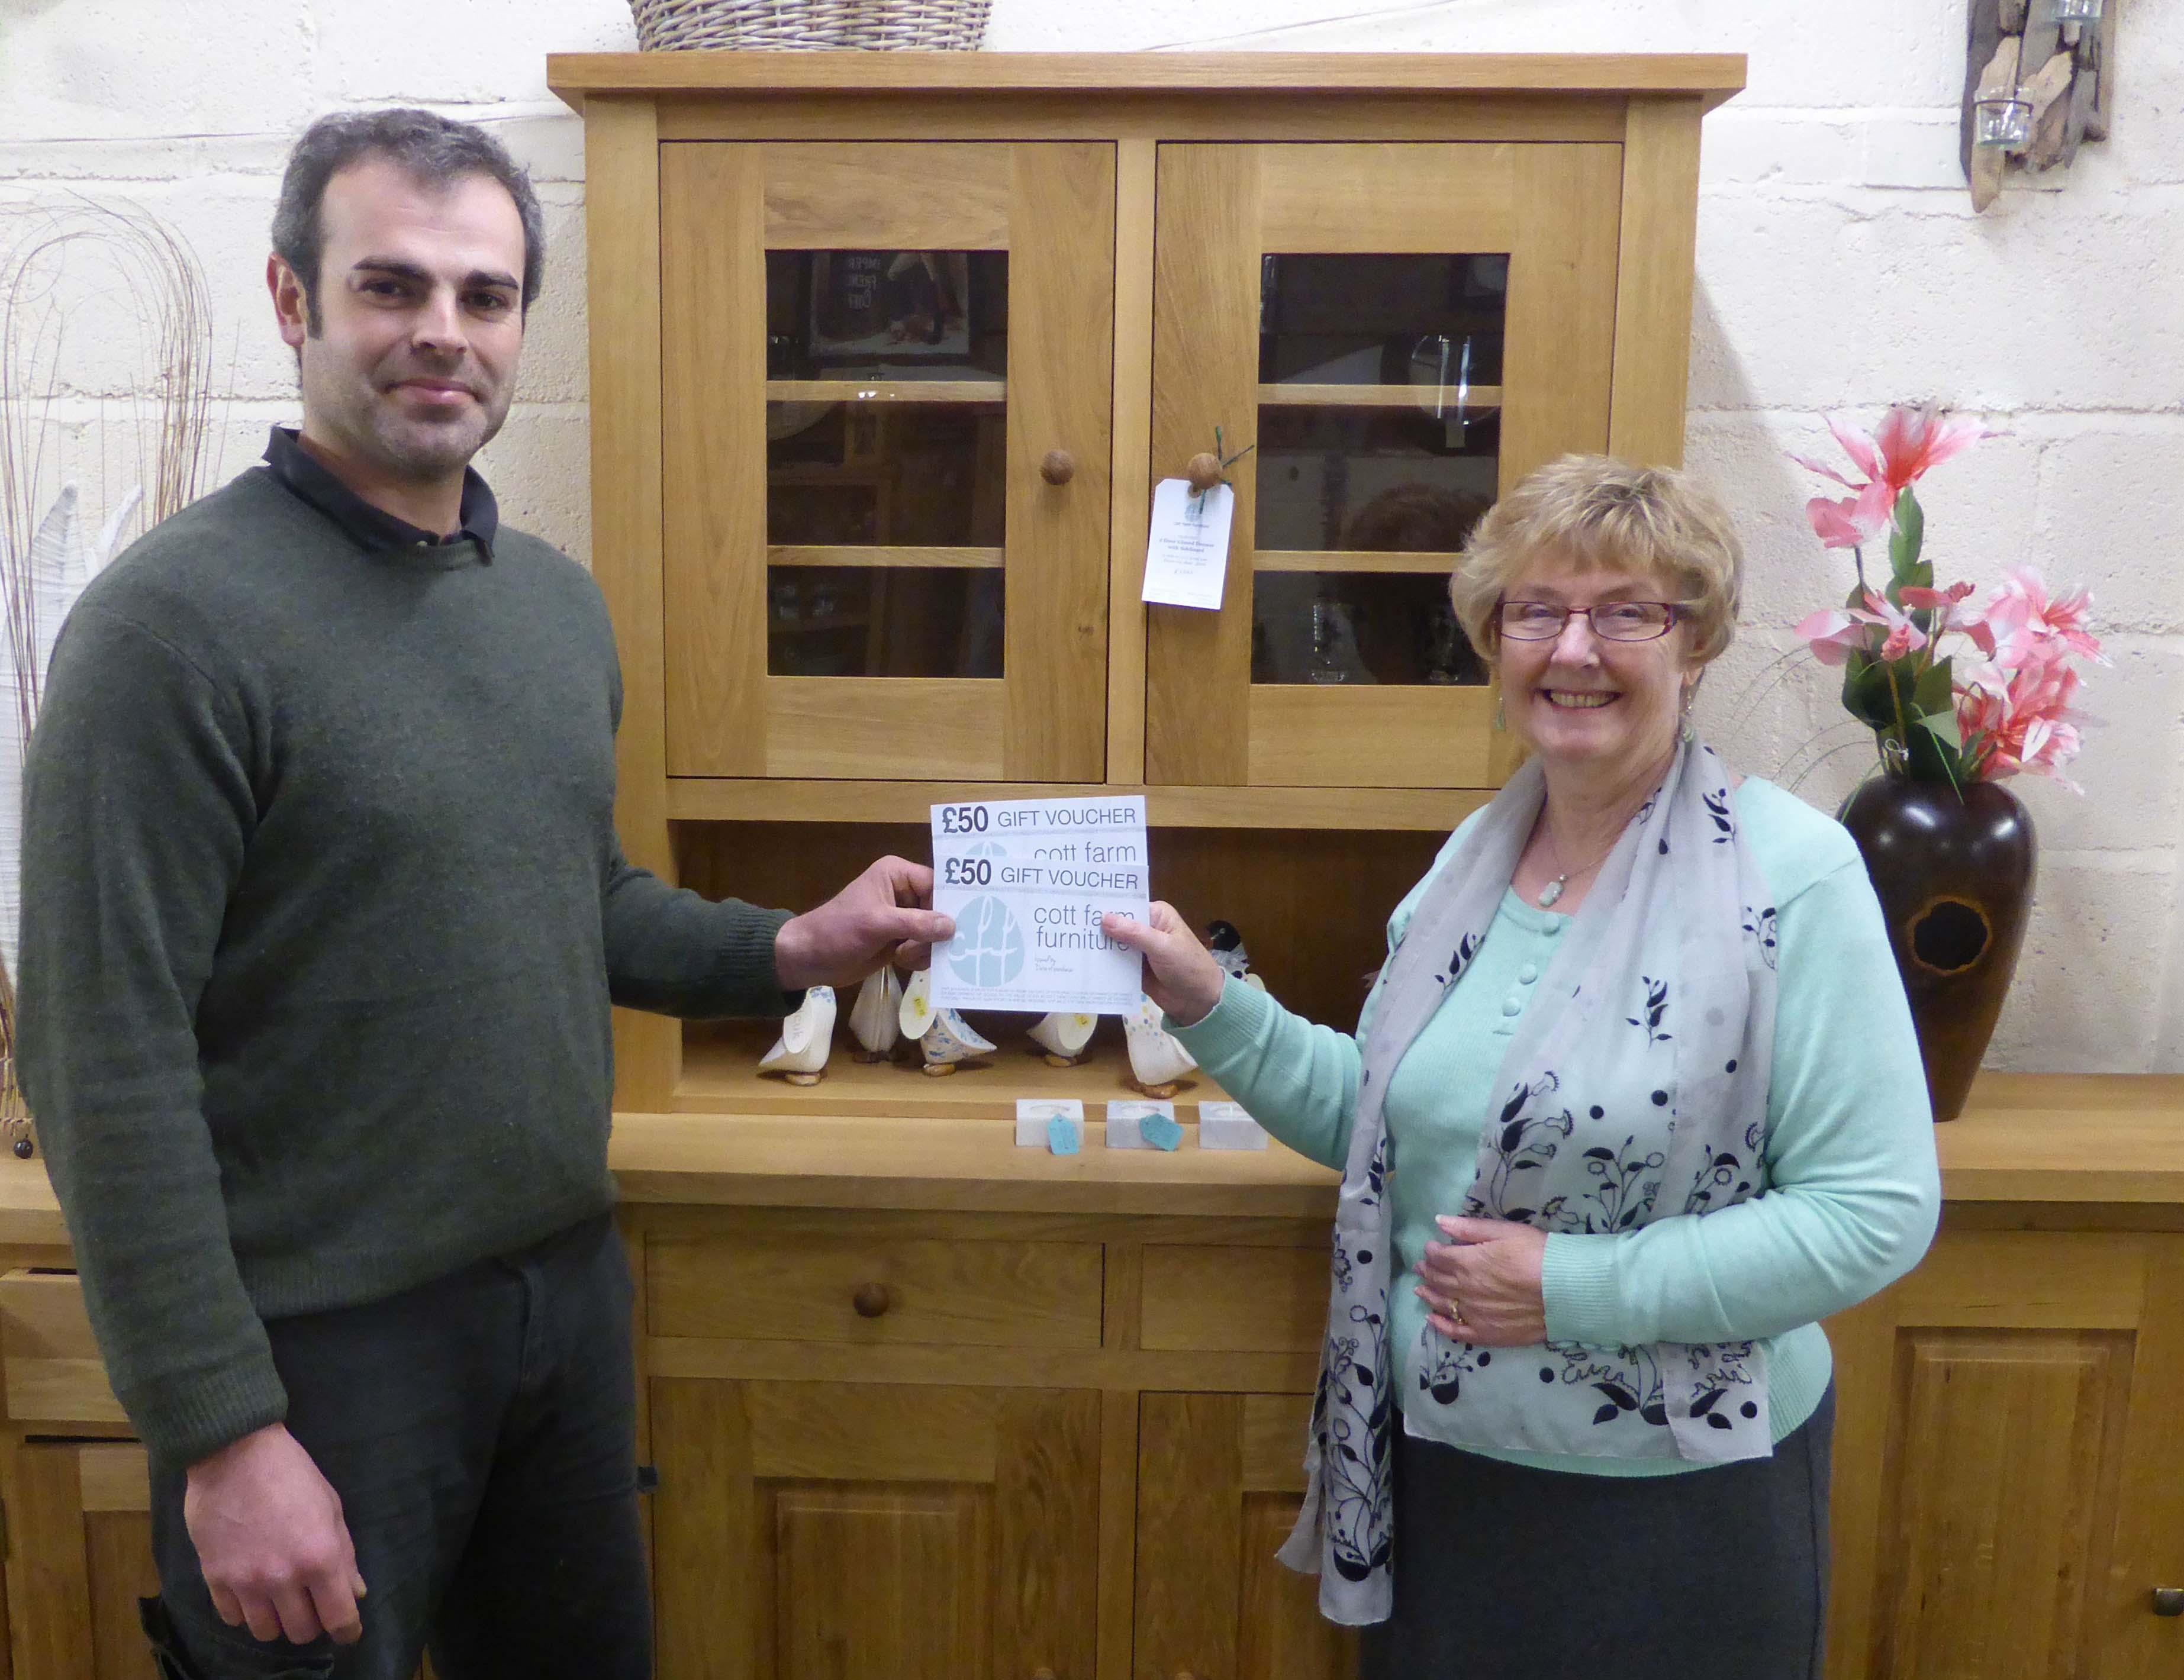 Press Release: Cott Farm Competition